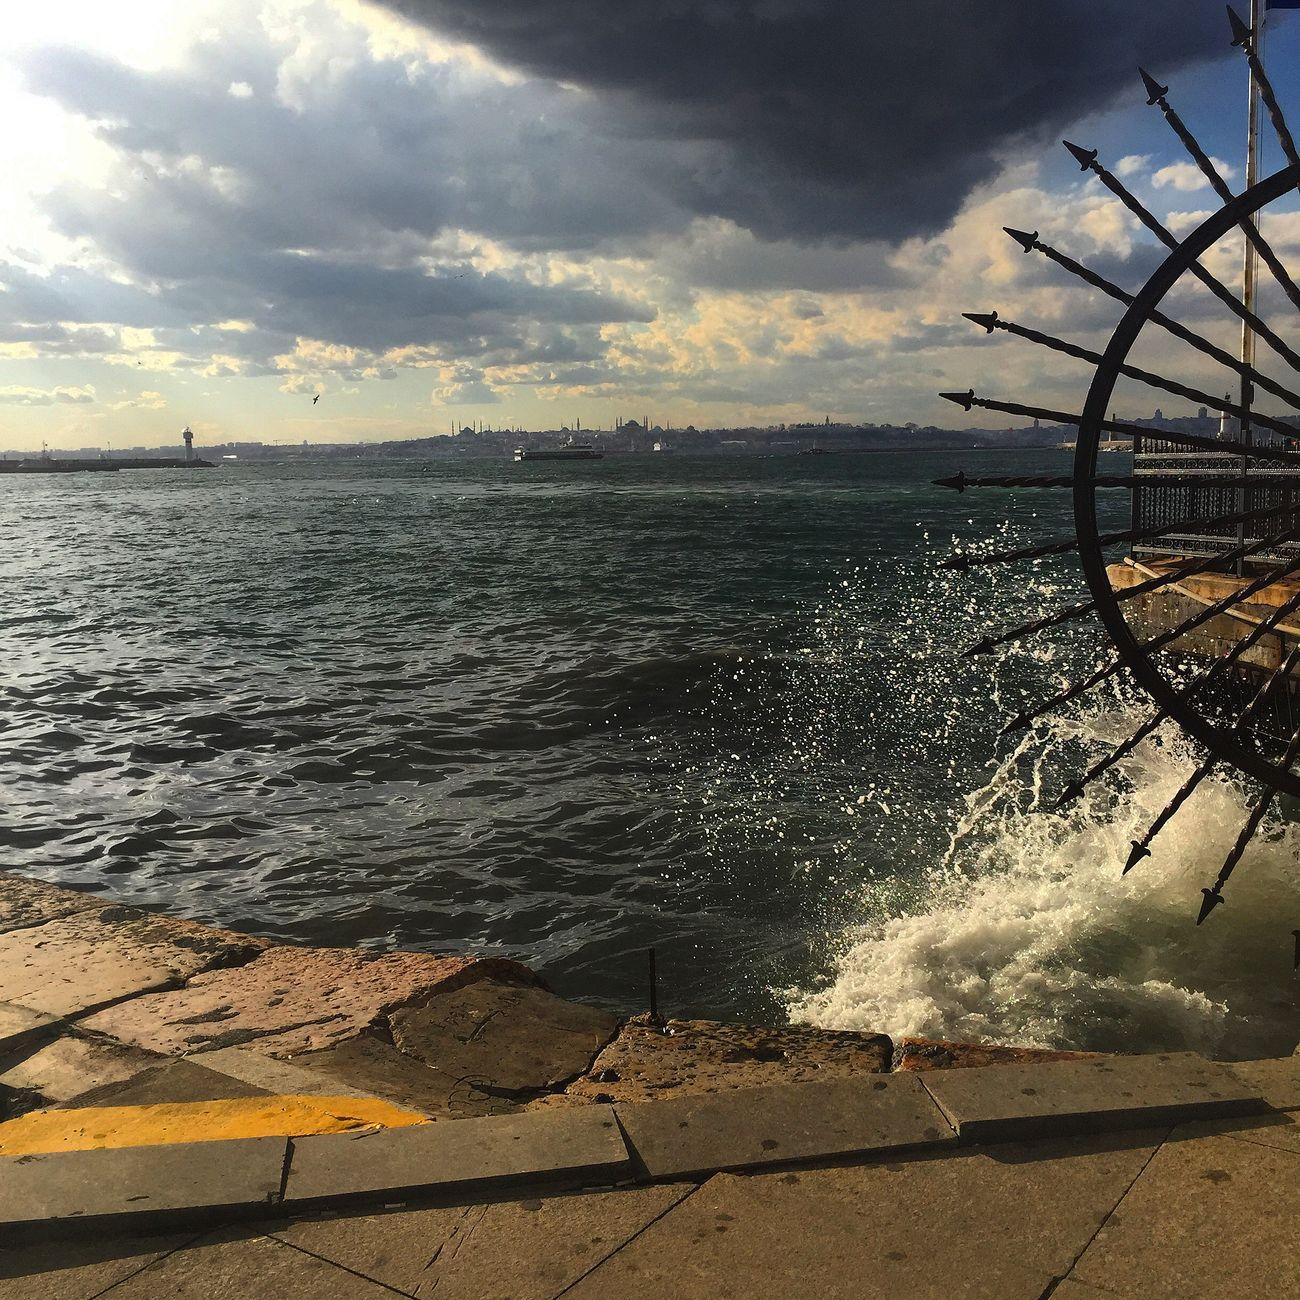 Vapur Deniz Sea Puslu Hava Sun EyeEm Nature Lover EyeEmBestEdits EyeEm First Eyeem Photo